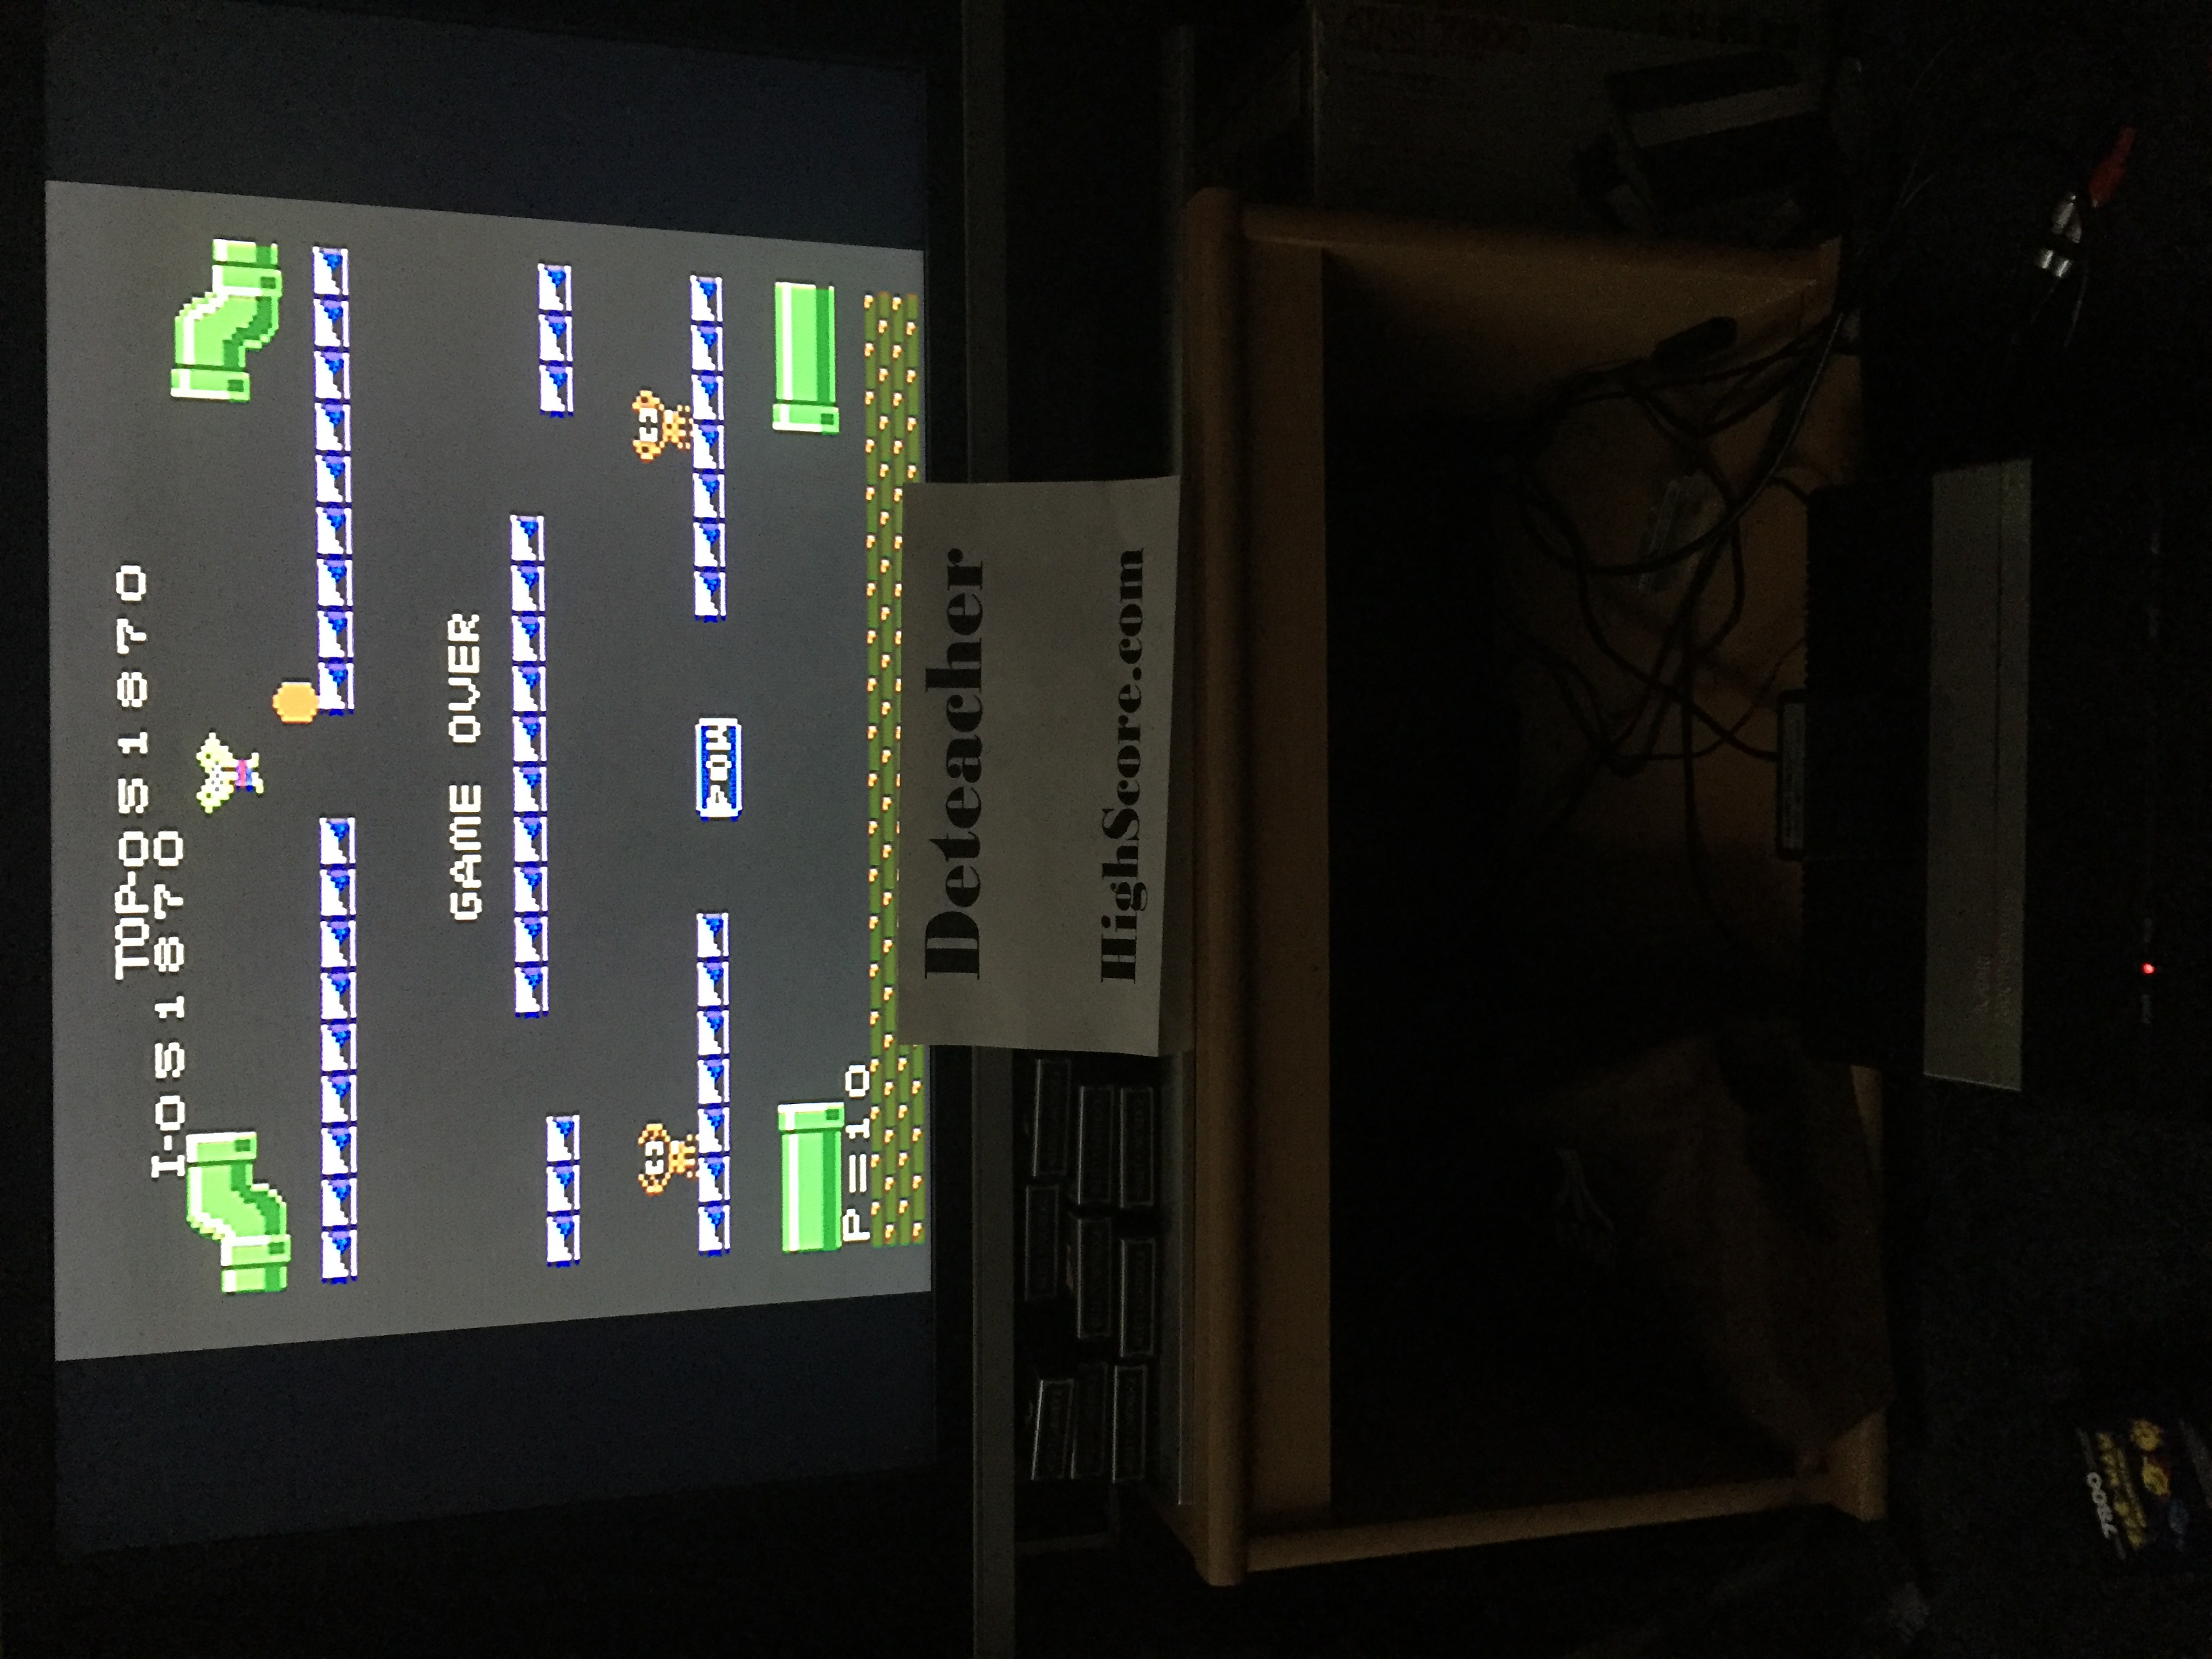 Deteacher: Mario Bros. [Advanced] (Atari 7800) 51,870 points on 2016-02-15 15:47:45